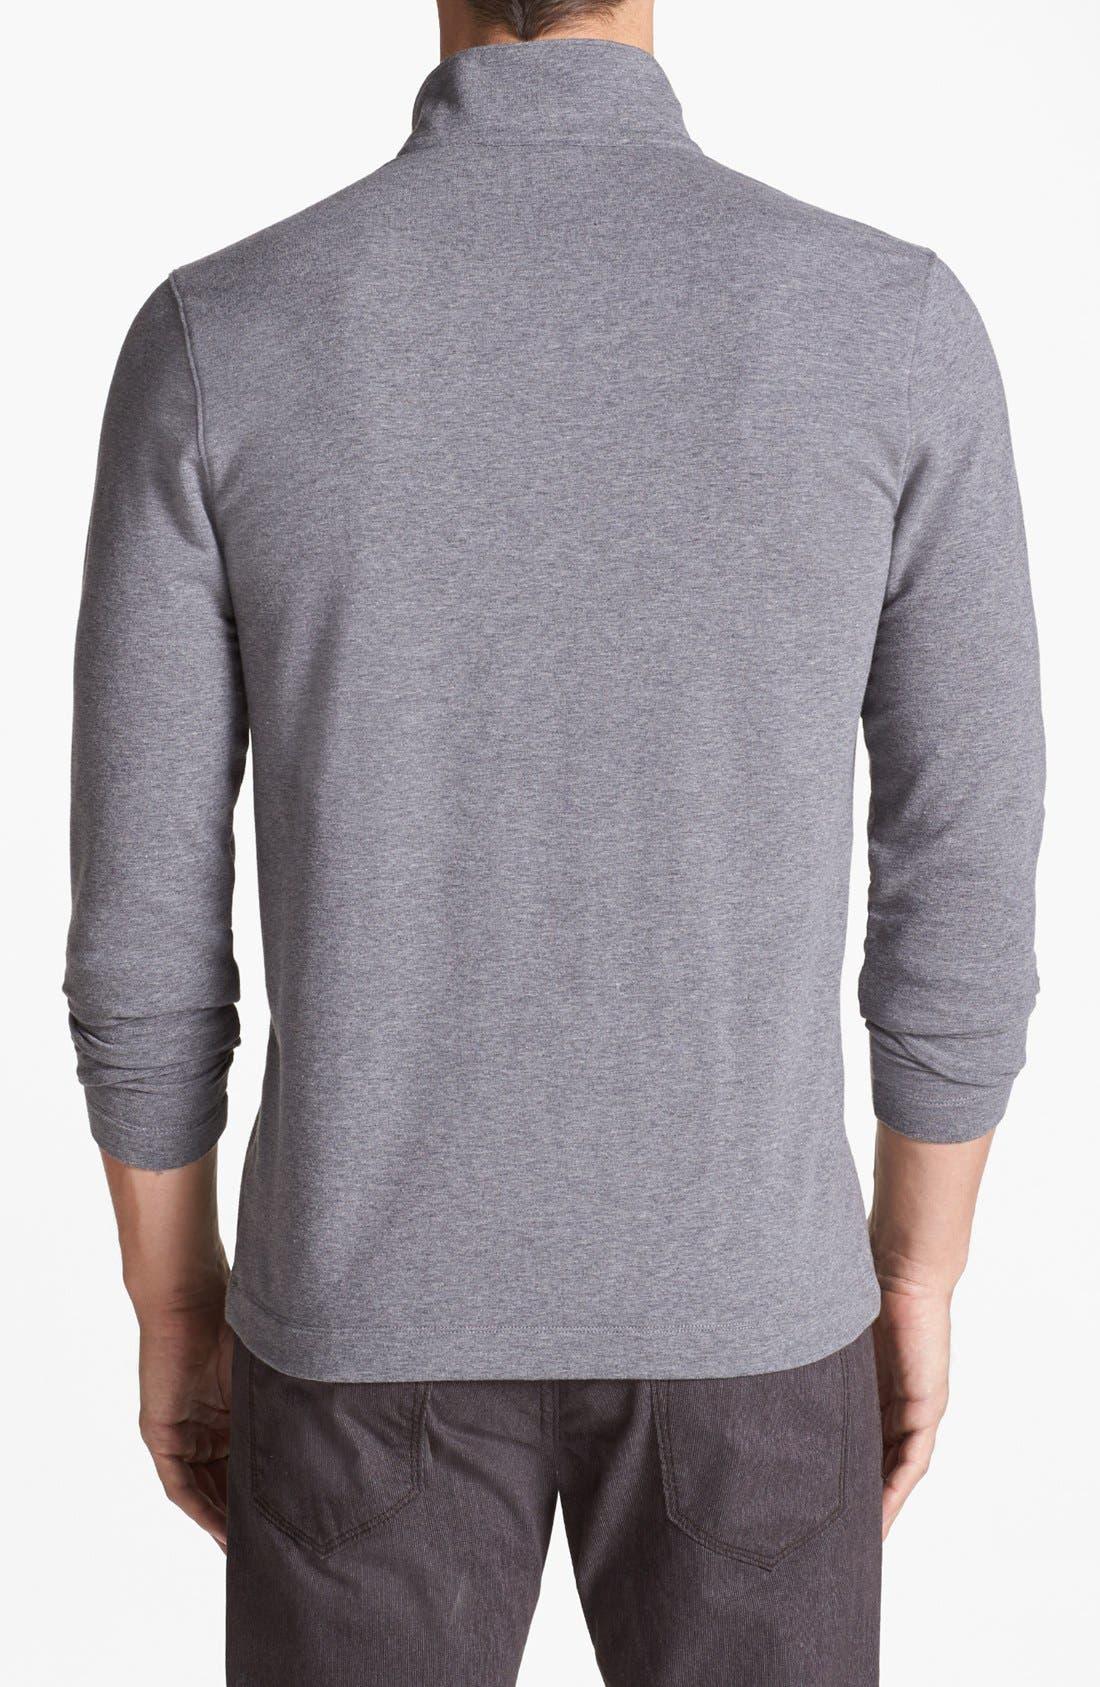 Alternate Image 2  - Michael Kors Fleece Long Sleeve Top